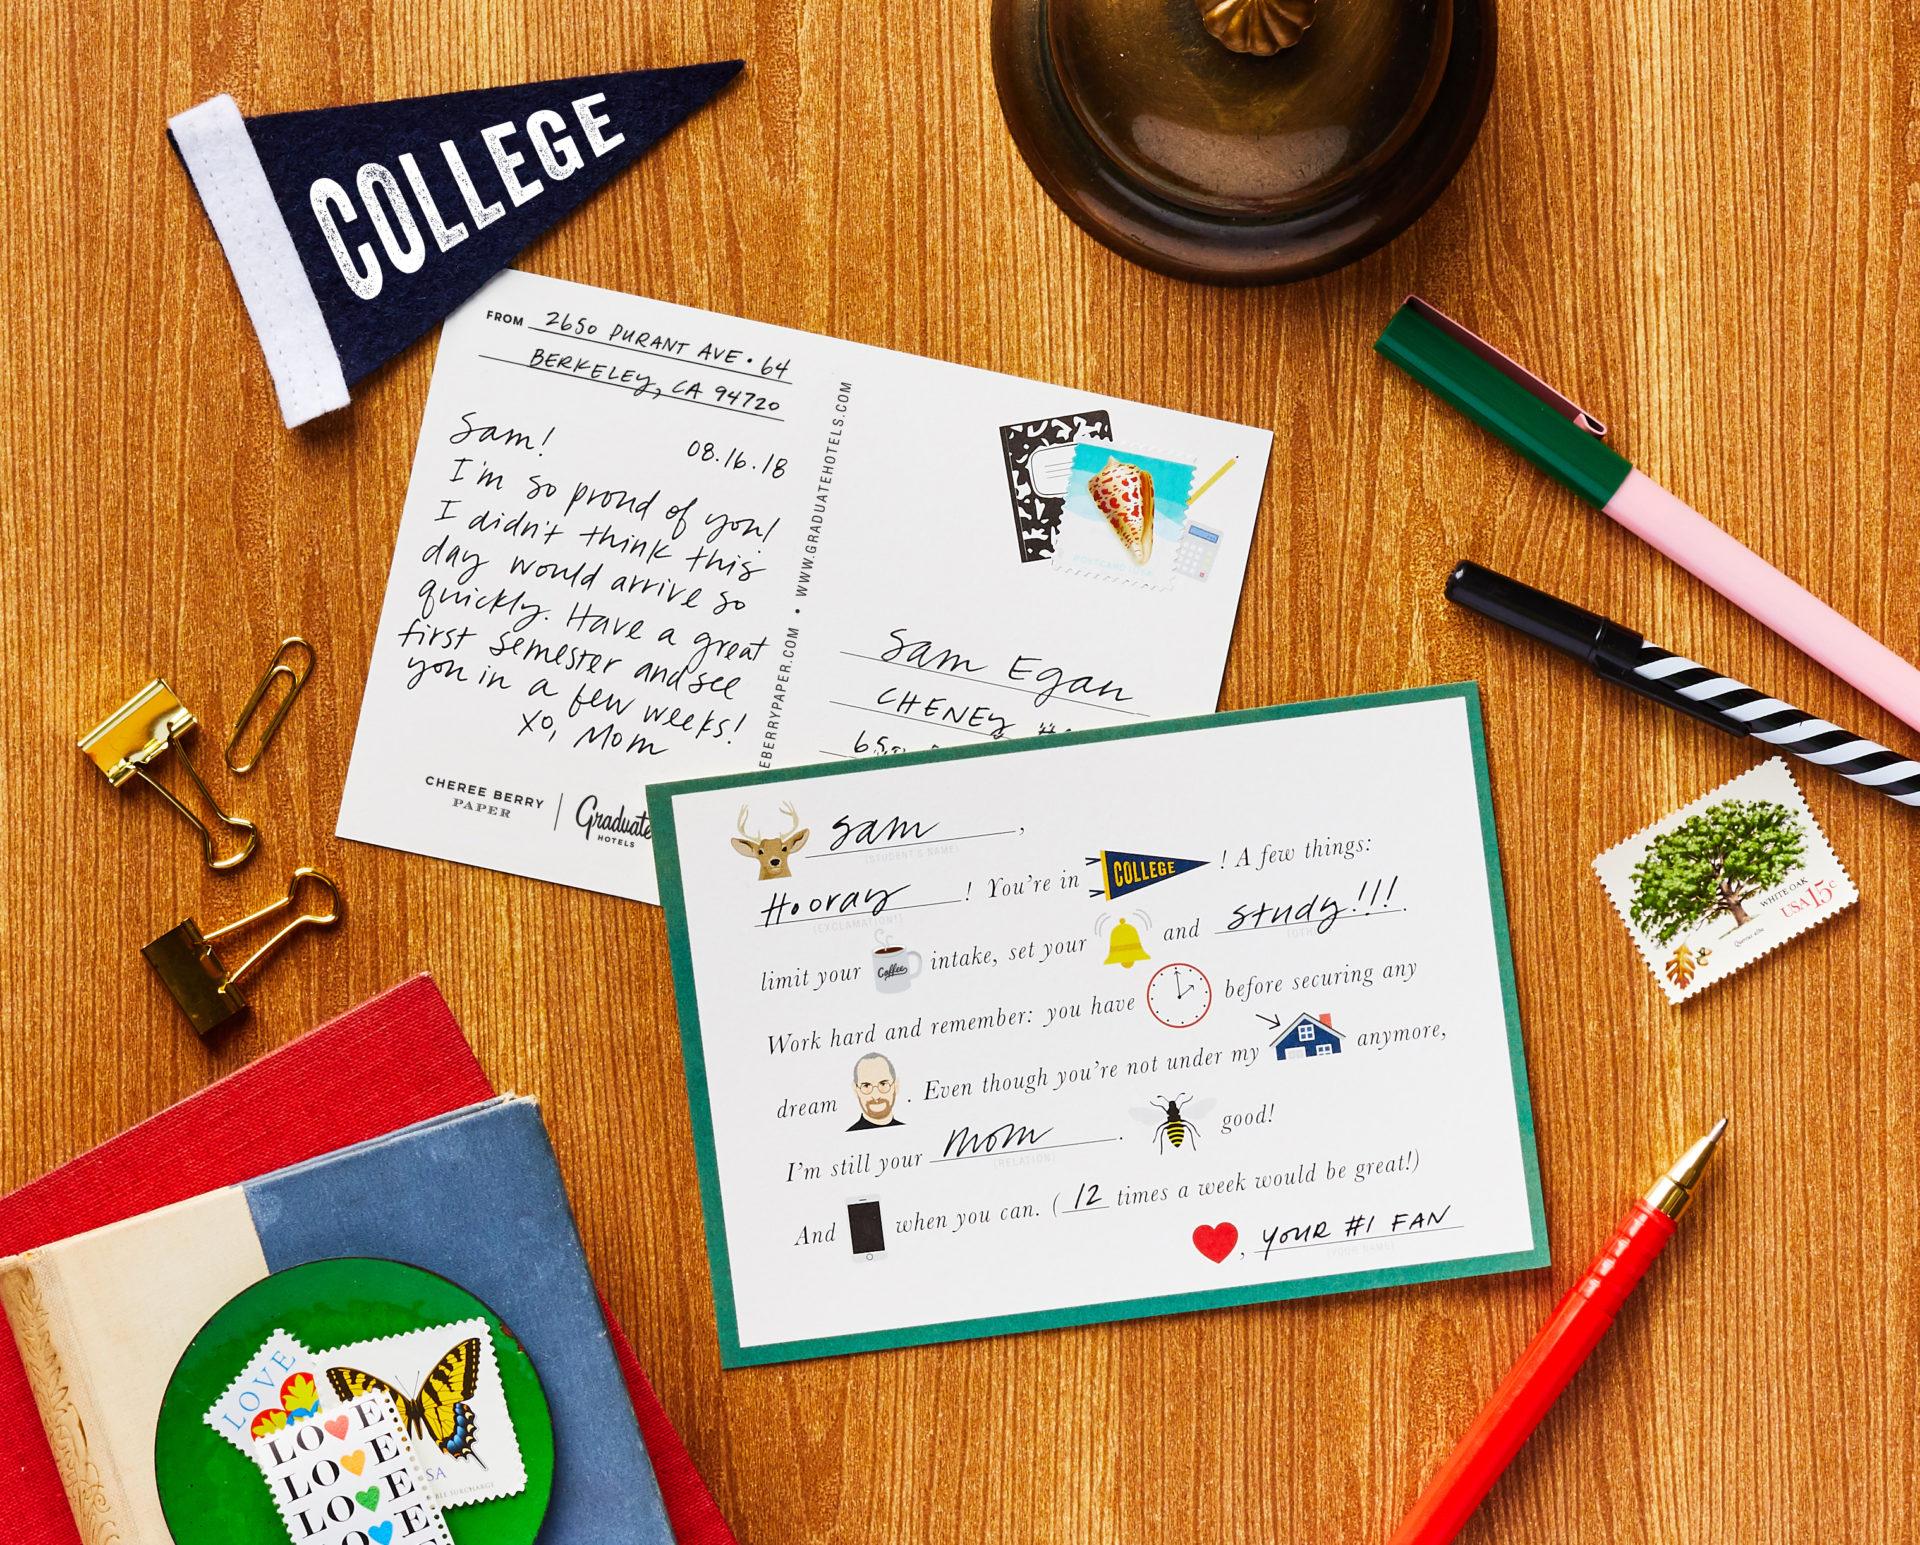 Graduate Hotels Postcard